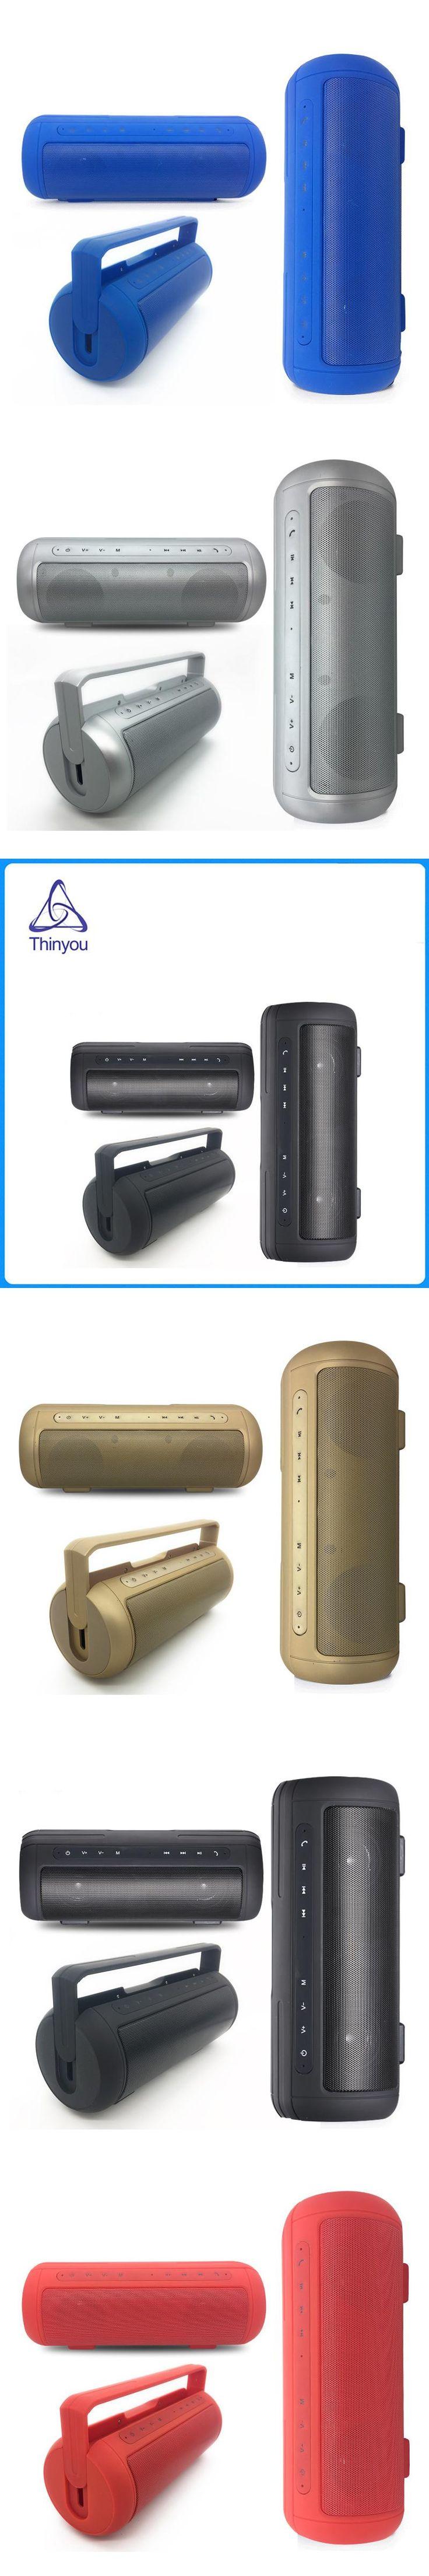 Thinyou Best Wireless Bluetooth Speaker Waterproof Portable Outdoor Mini Column Box Loudspeaker MP3 Player Handsfree FM Mic TF